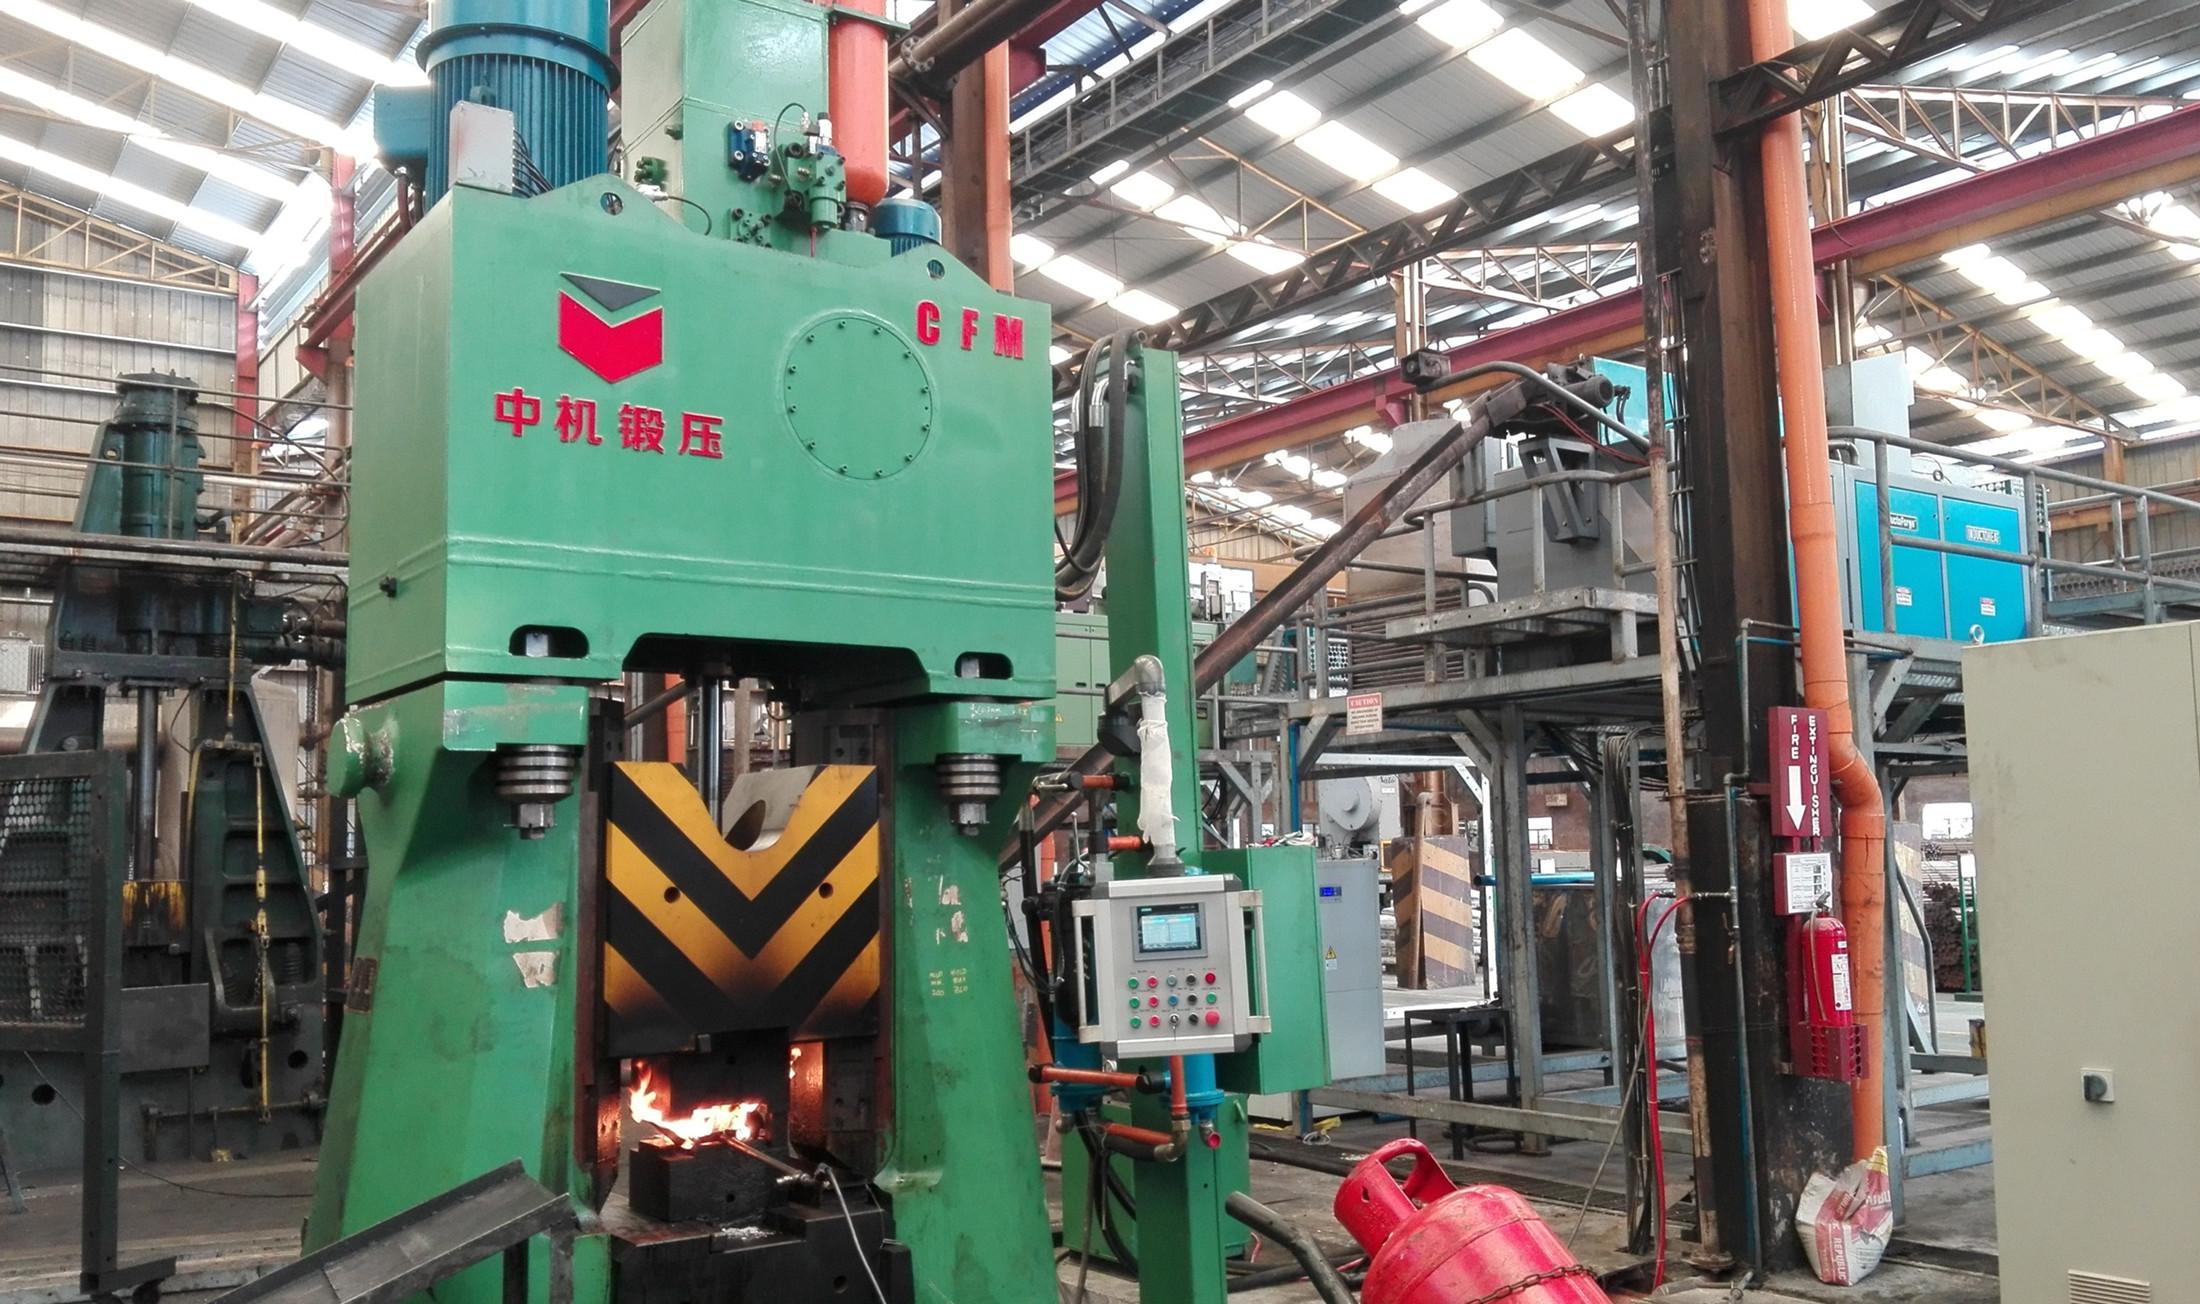 C88K-25kJ Electro Hydarulic Die Forging Hammer/Steam Forging Hammer working in Philippines